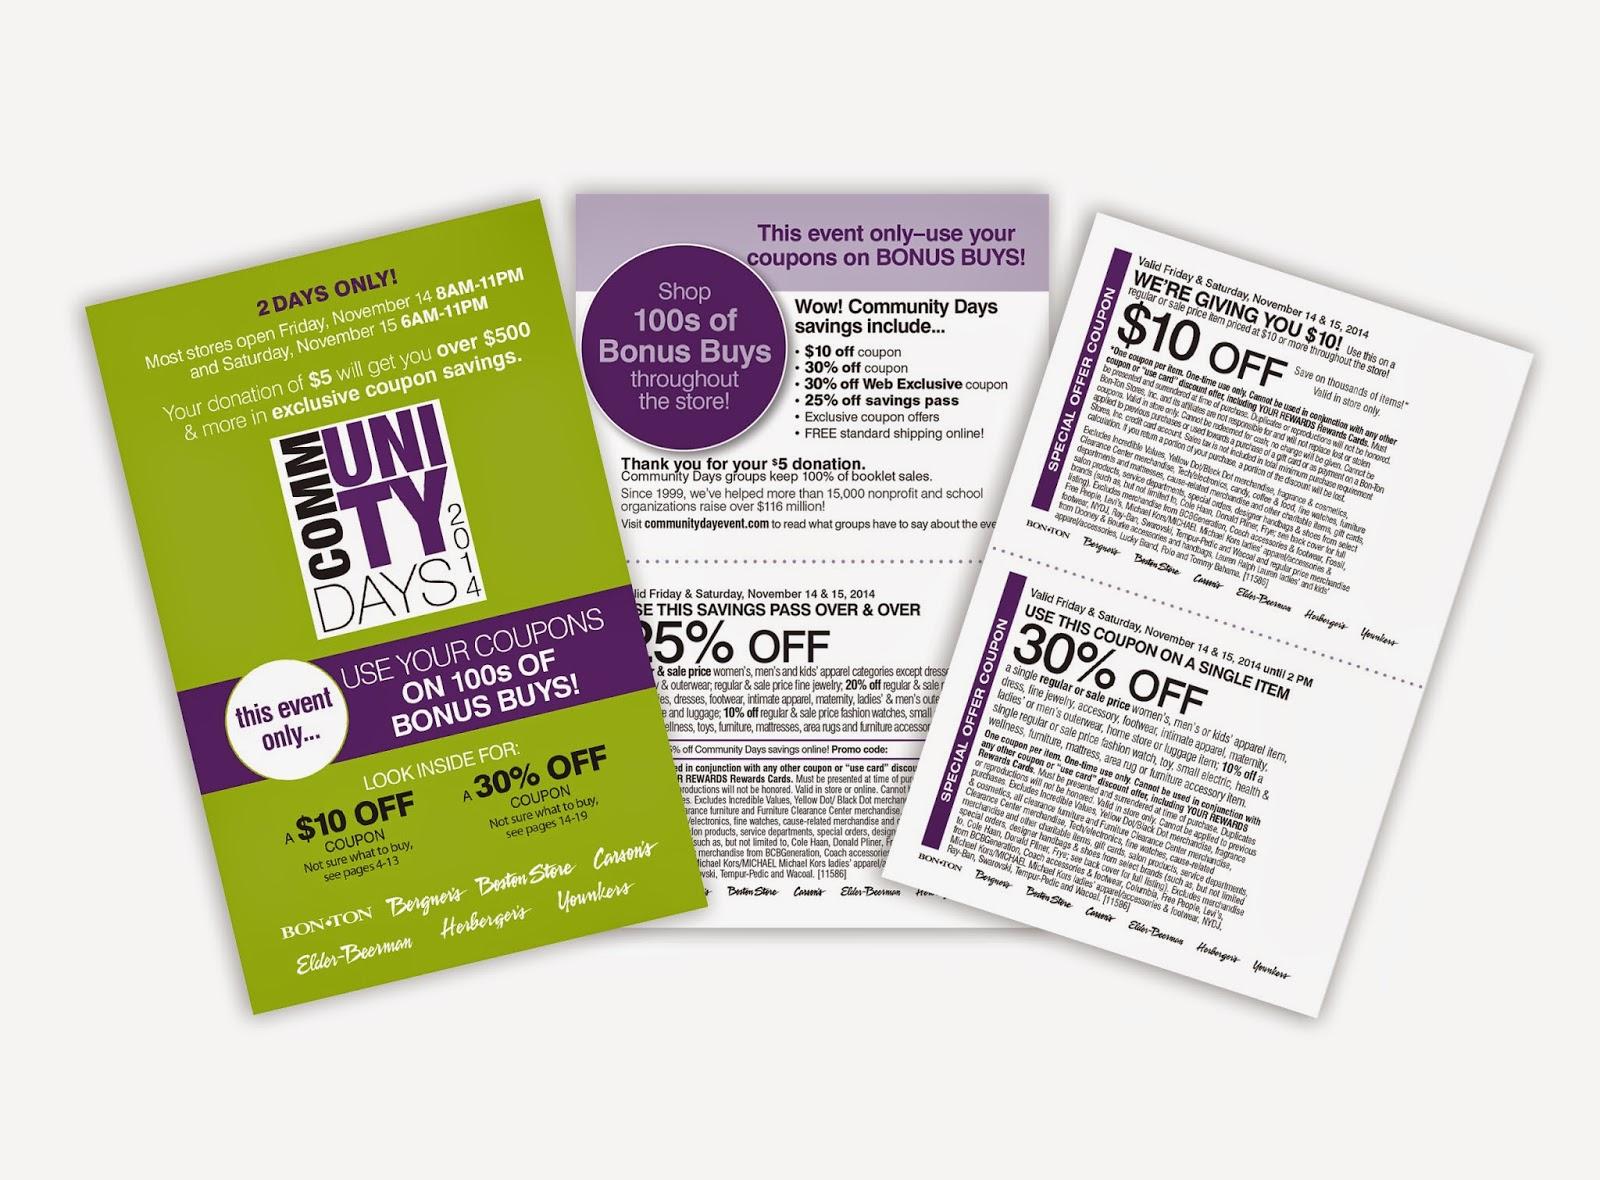 image regarding Carson Pirie Scott Printable Coupons named Carsons coupon : Kanita warm springs oregon